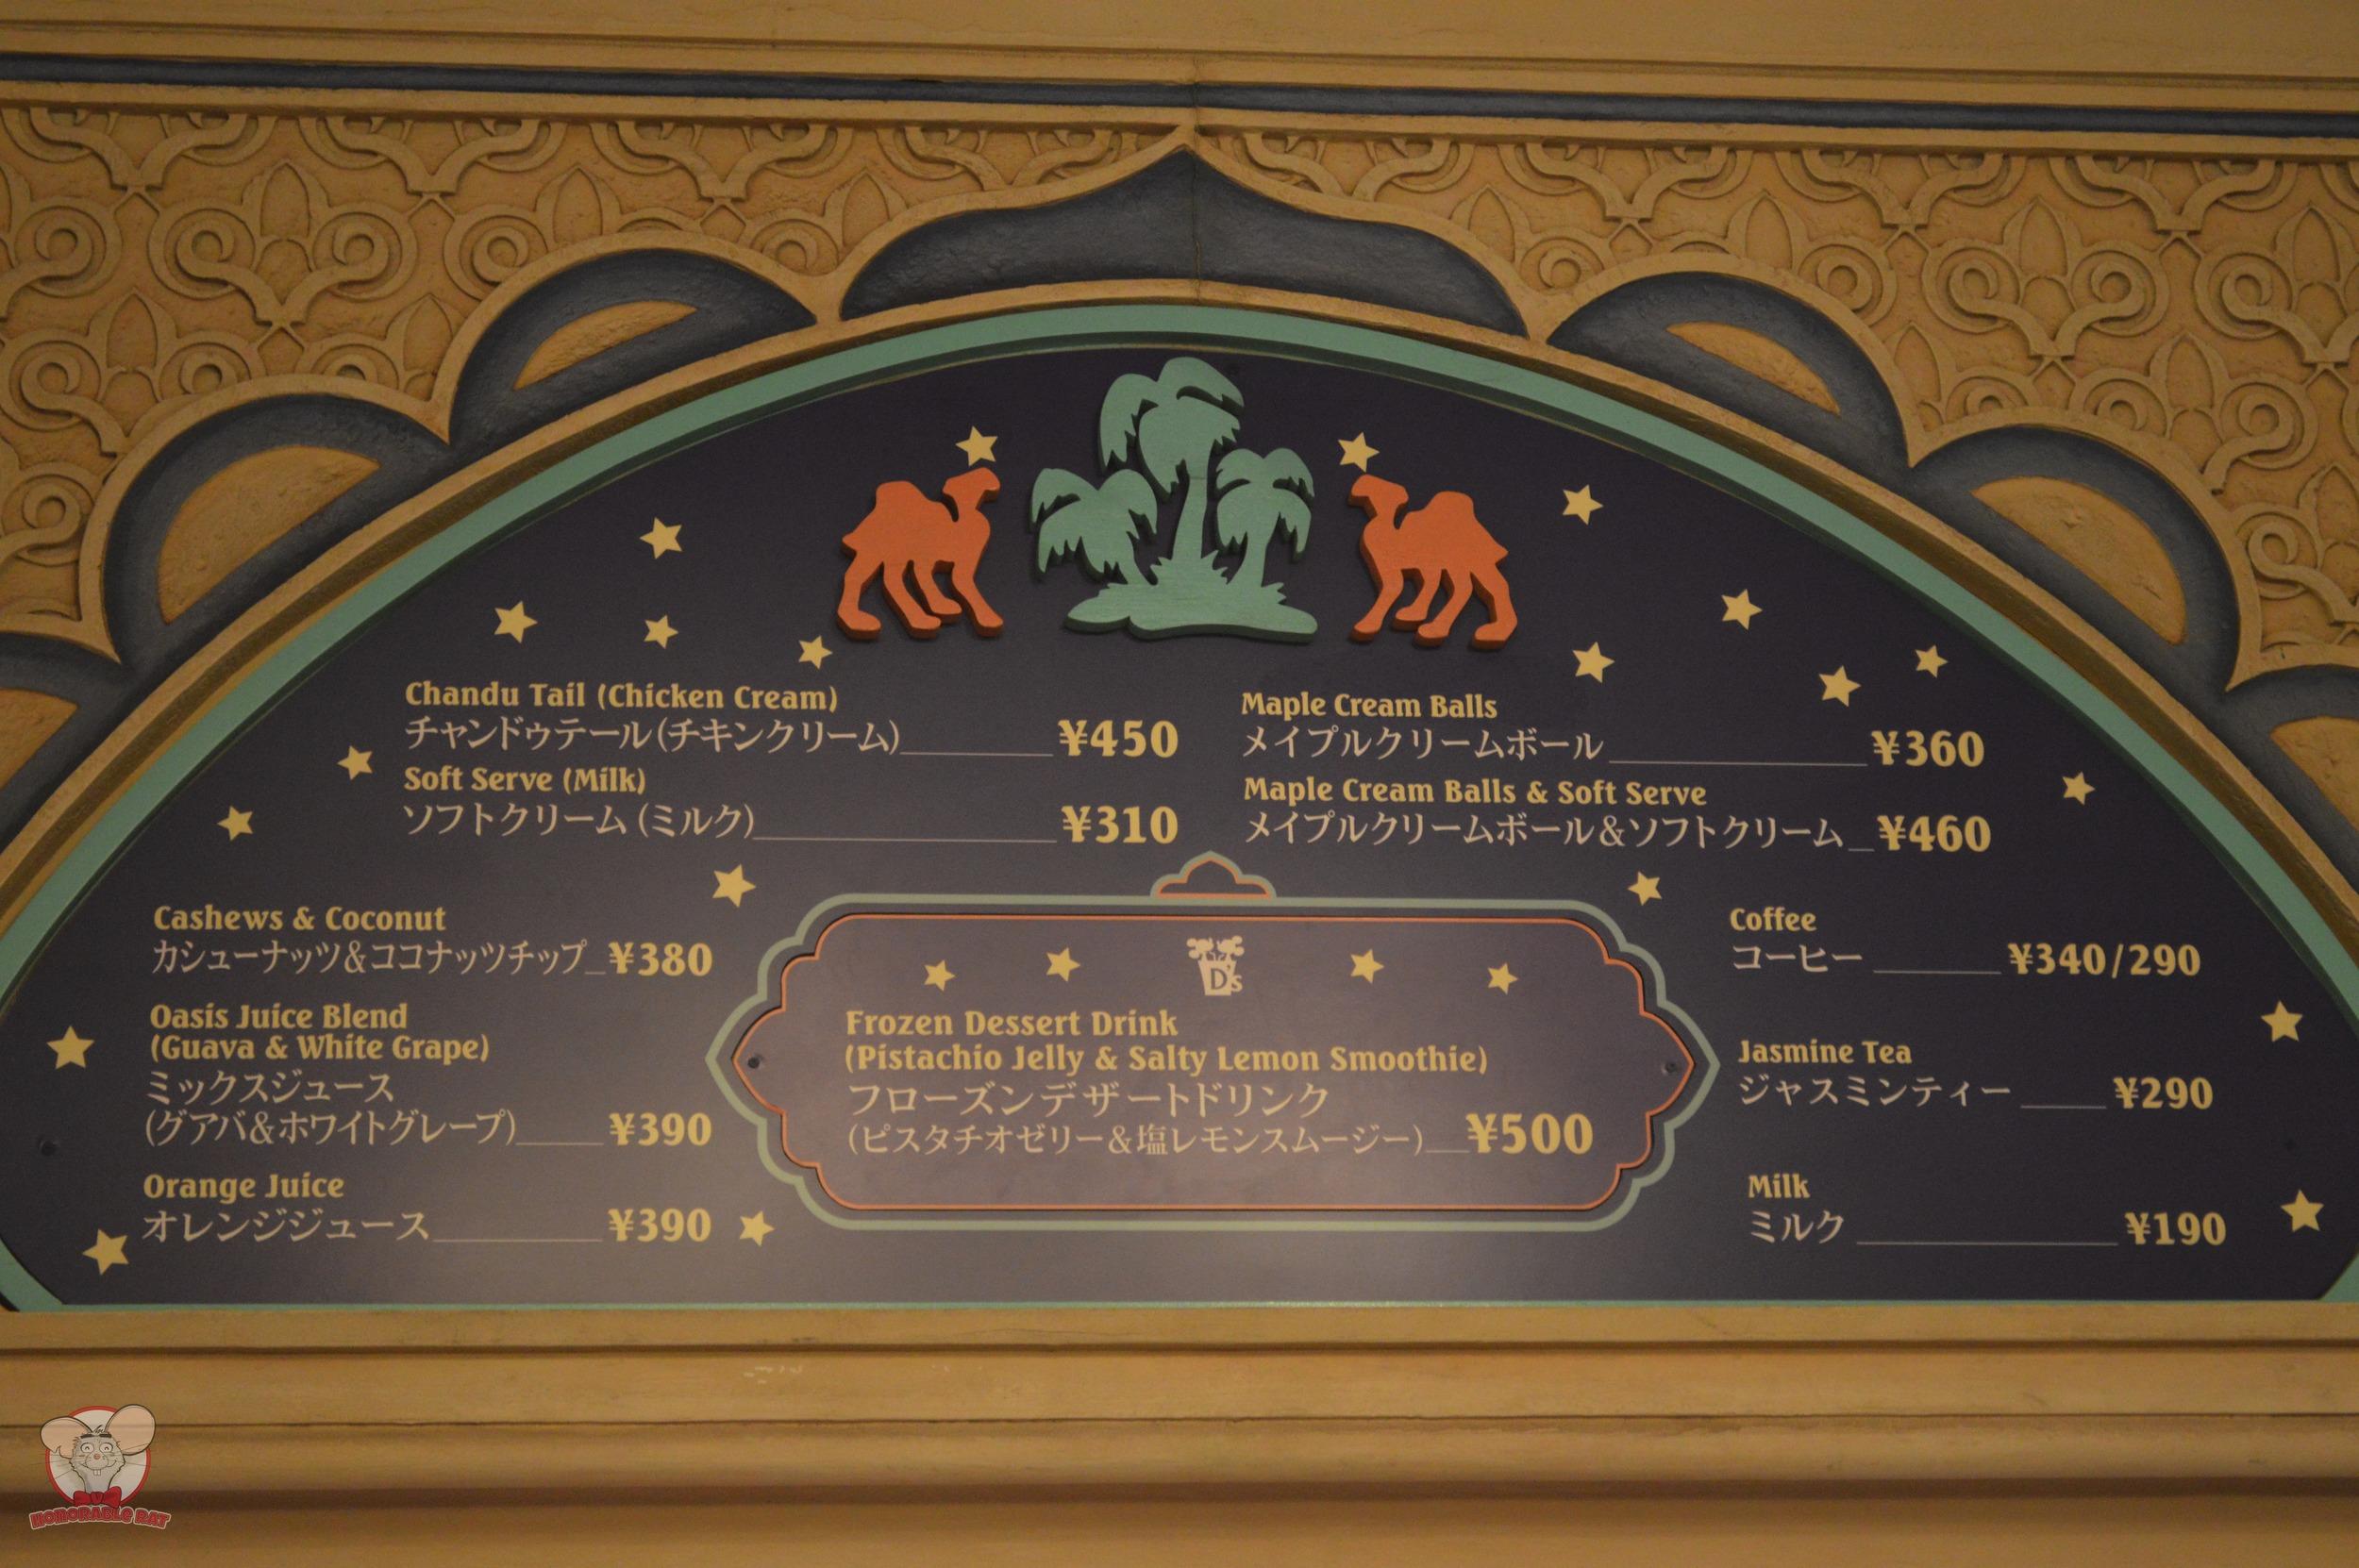 Sultan's Oasis's menu